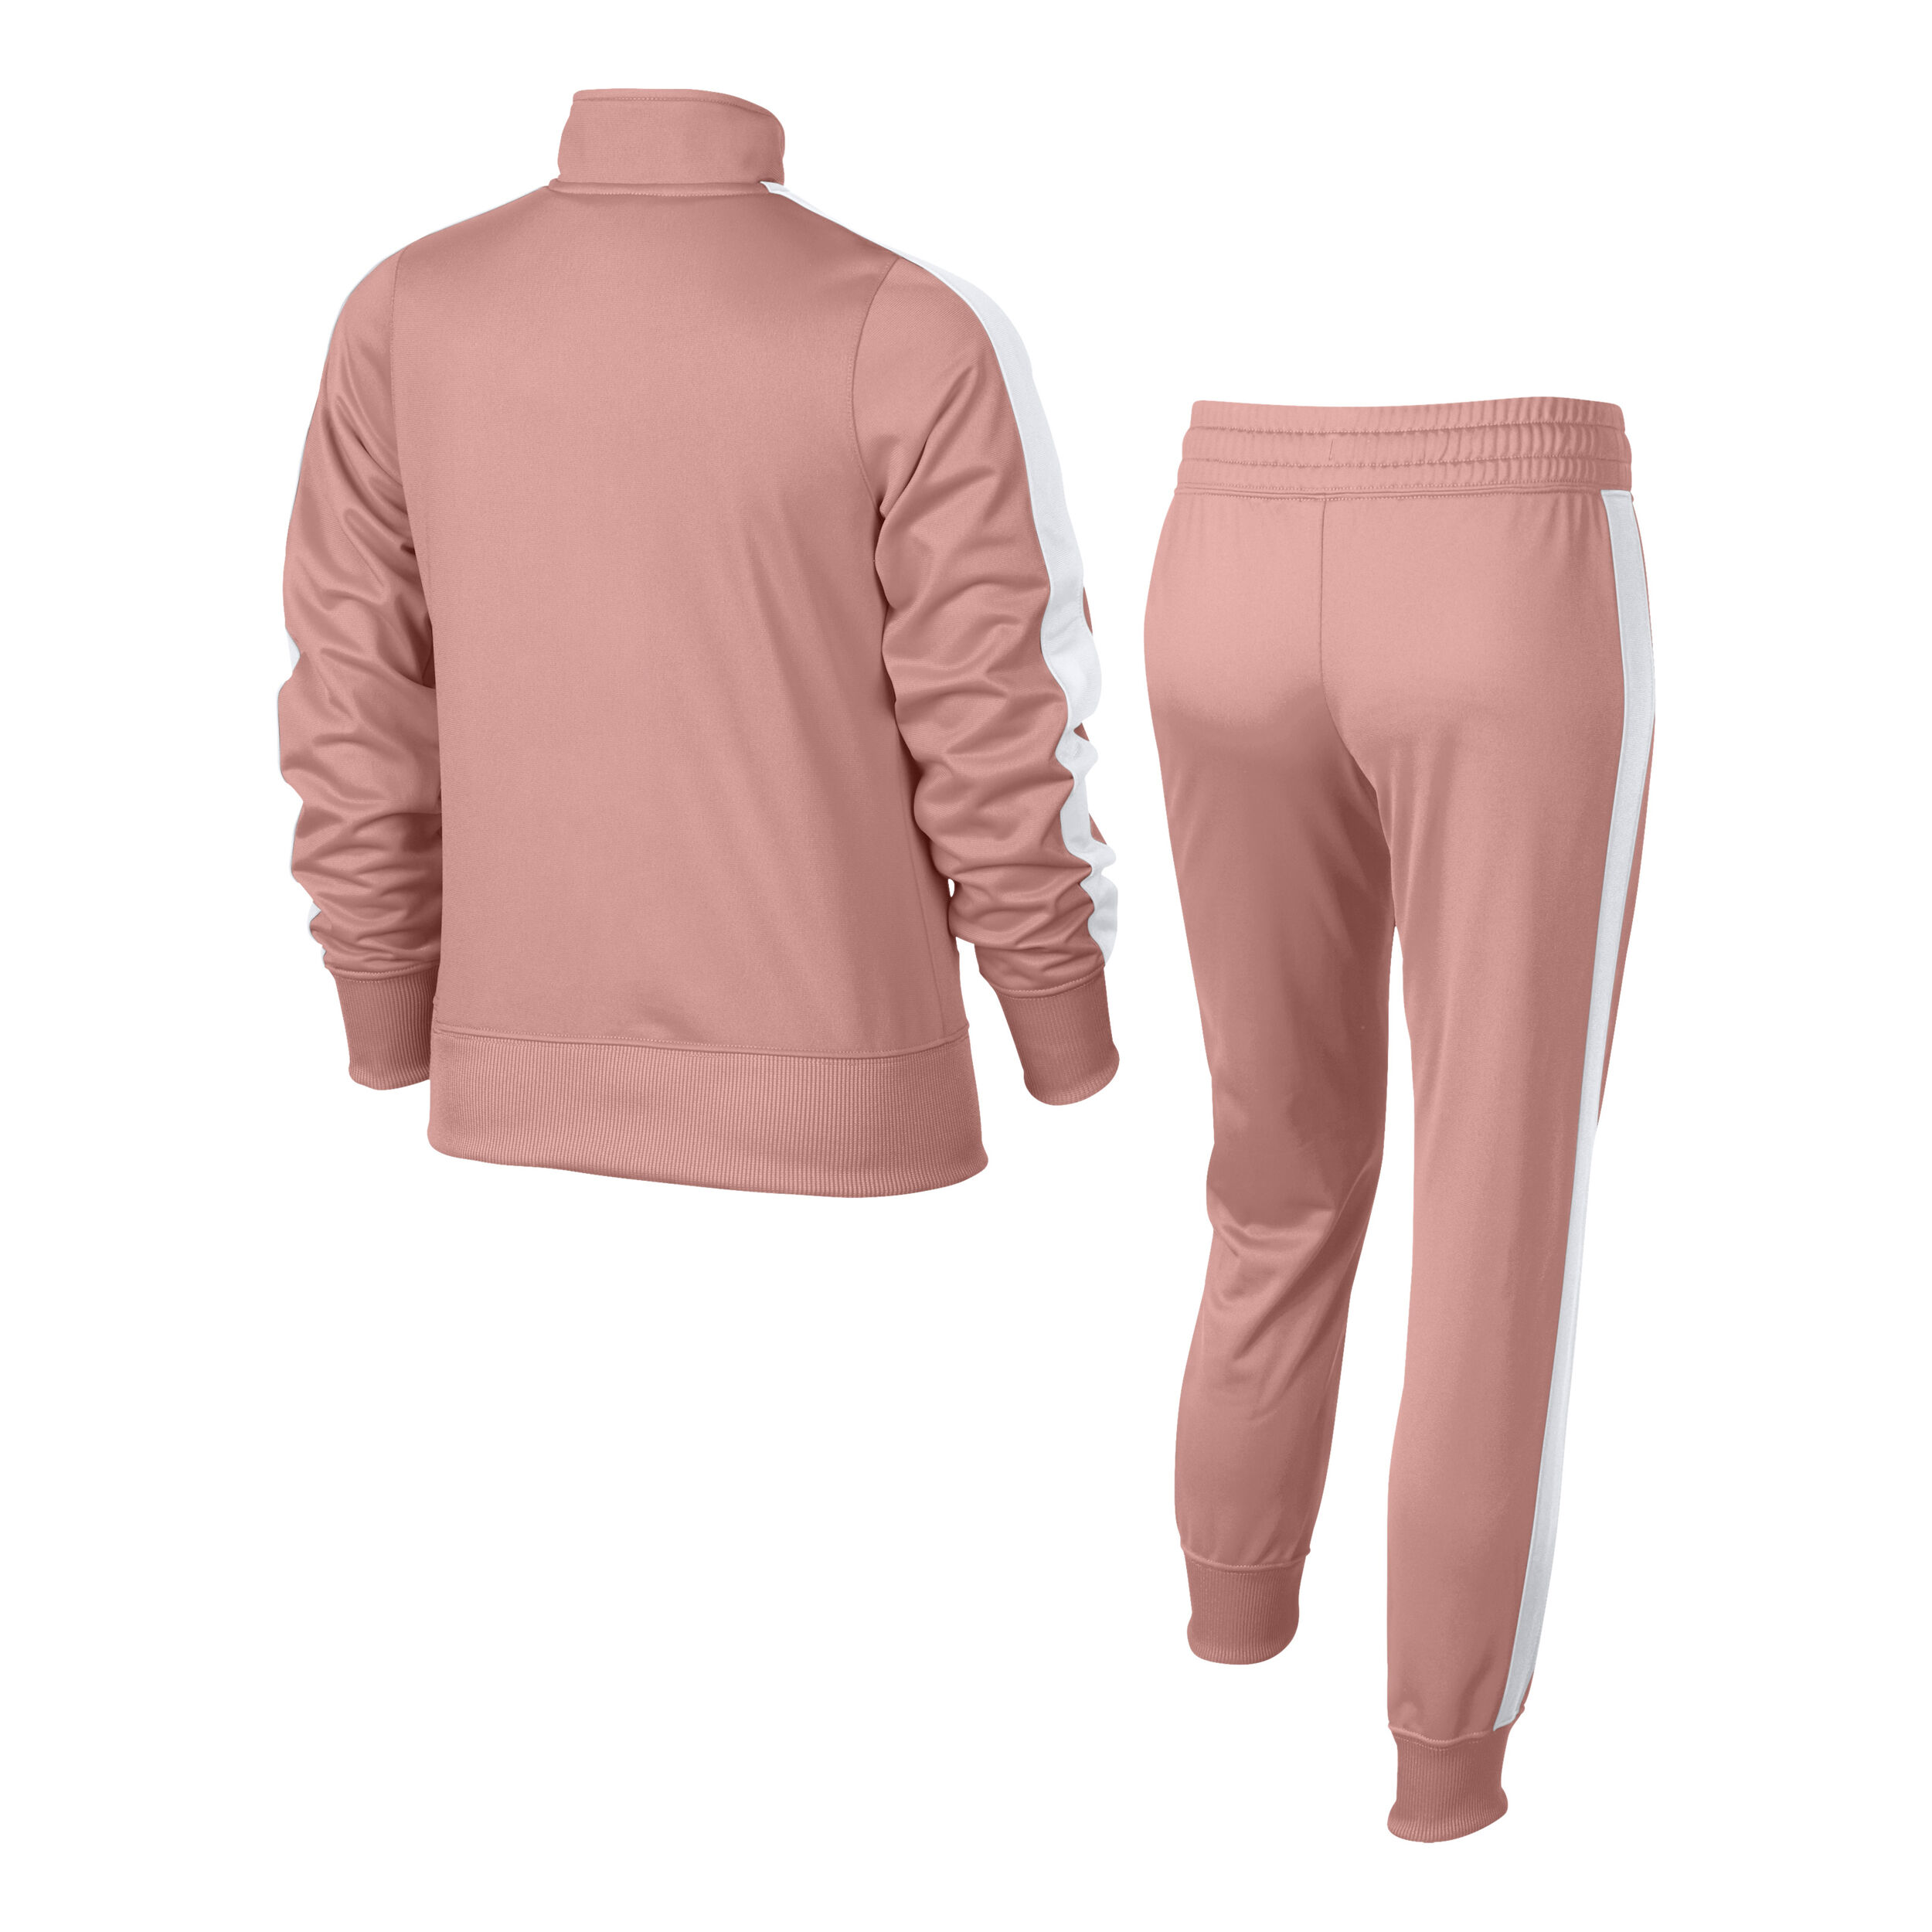 Nike Sportswear Tricot Trainingsanzug Mädchen Rosa, Weiß